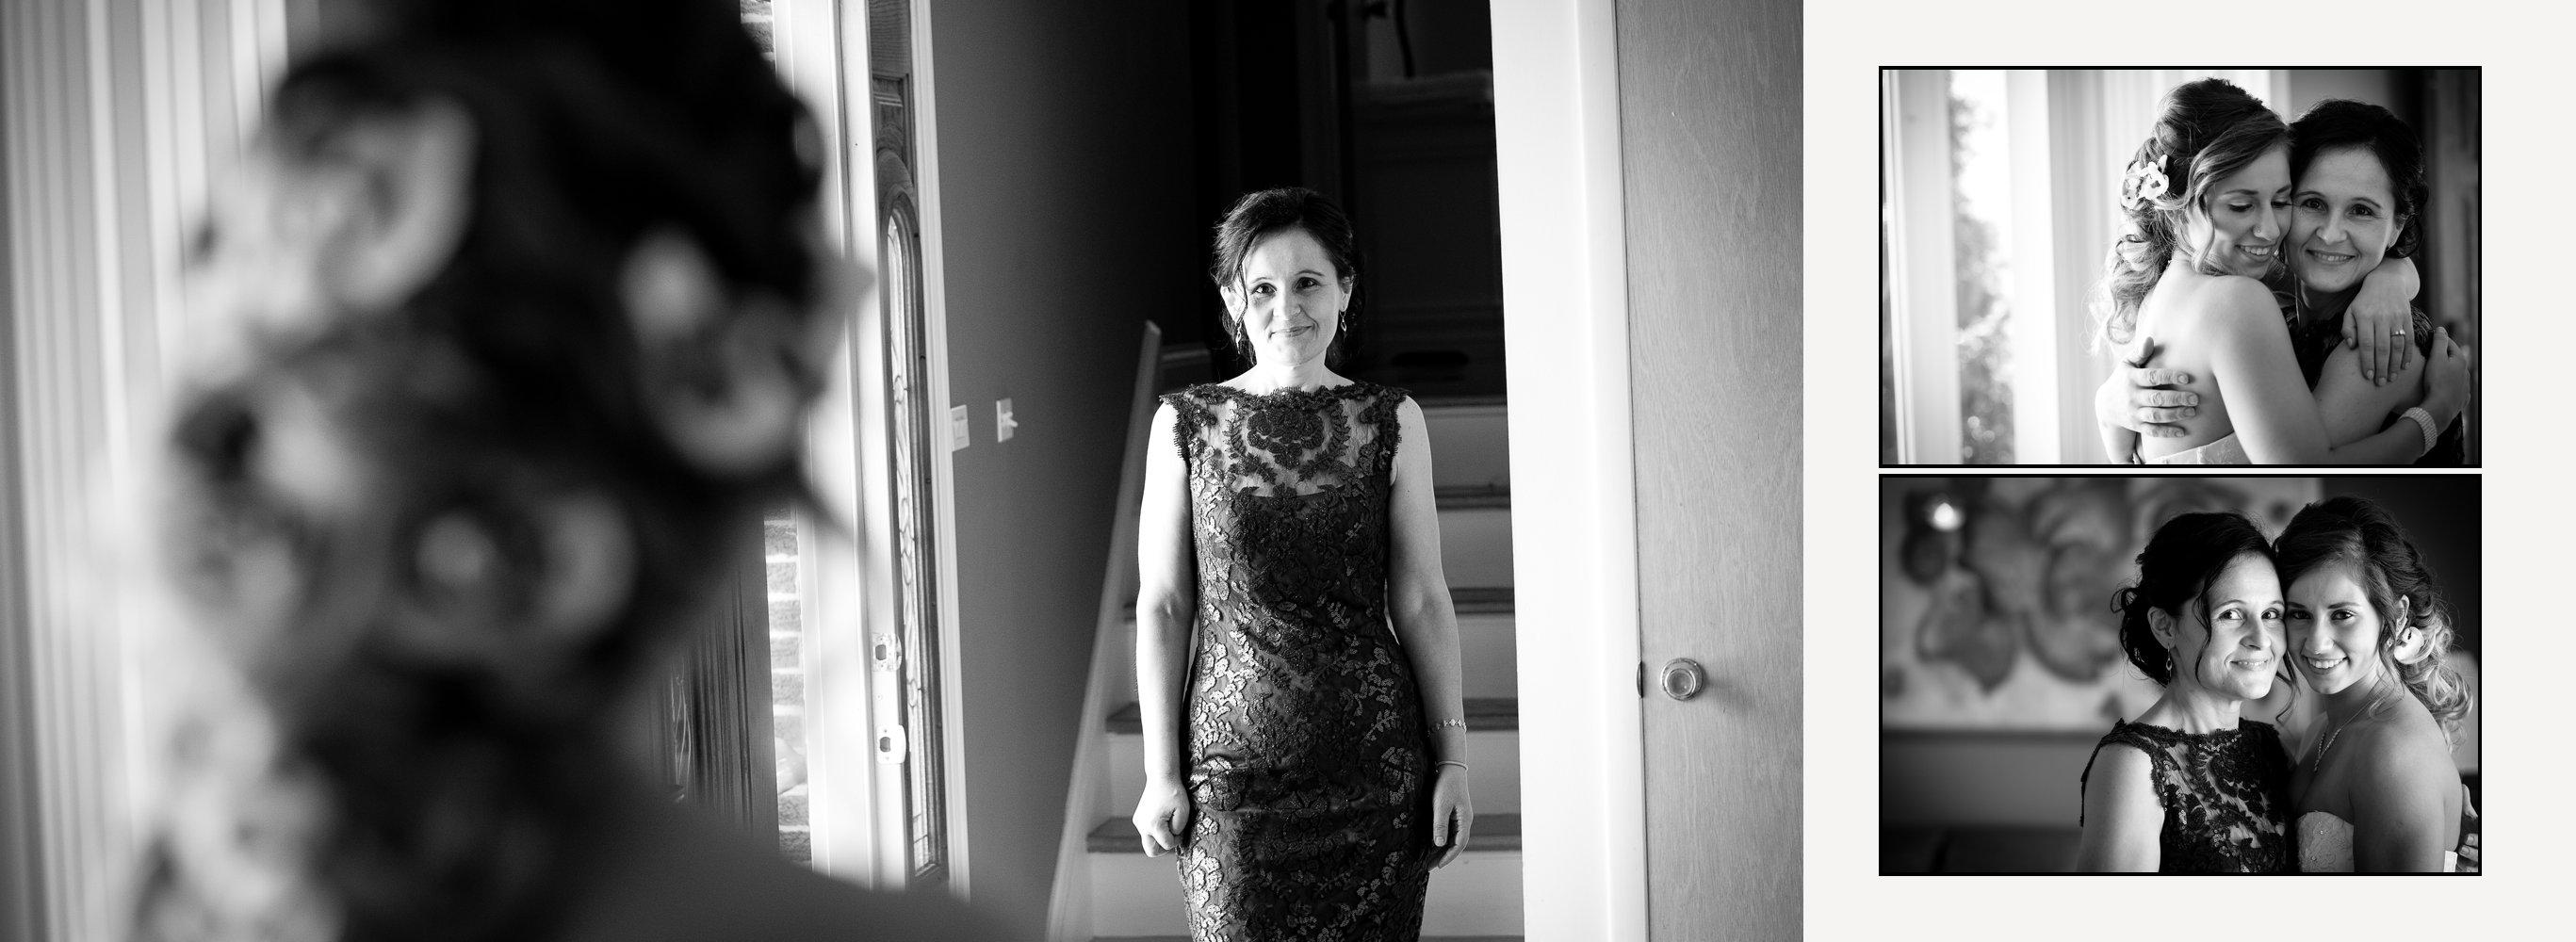 Custom designed wedding album spreads with all black and white photographs